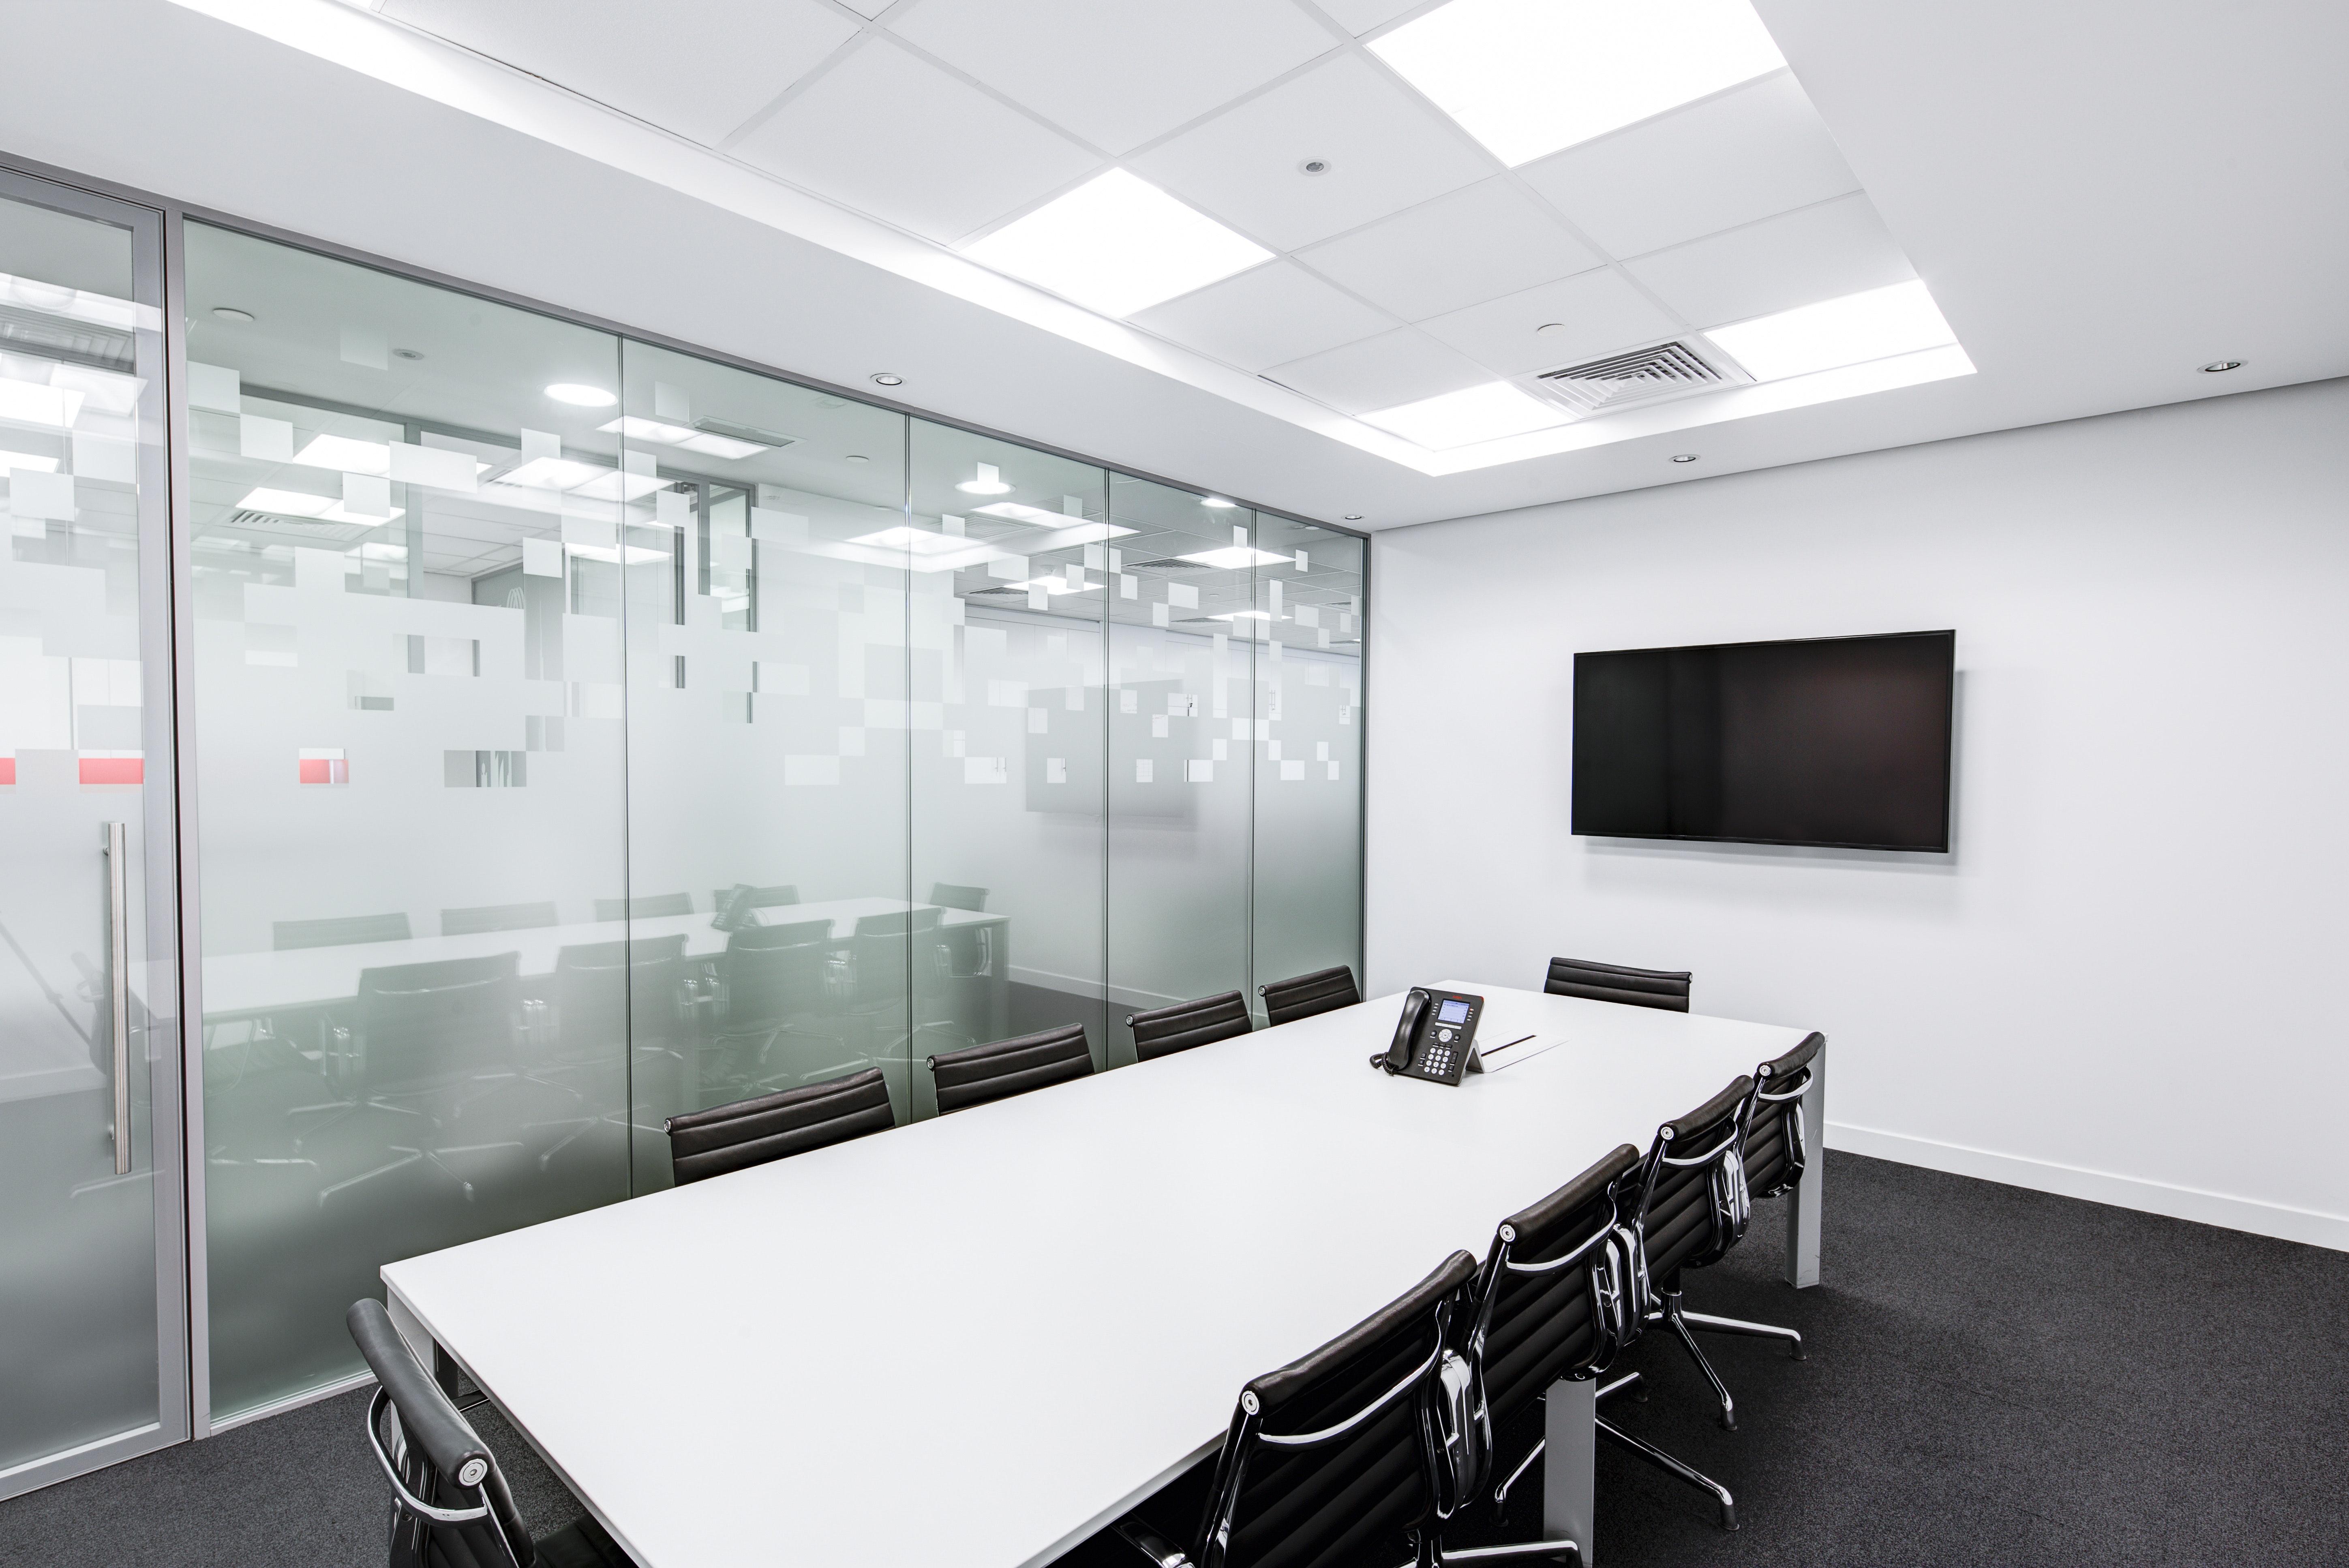 60x60 led panel light